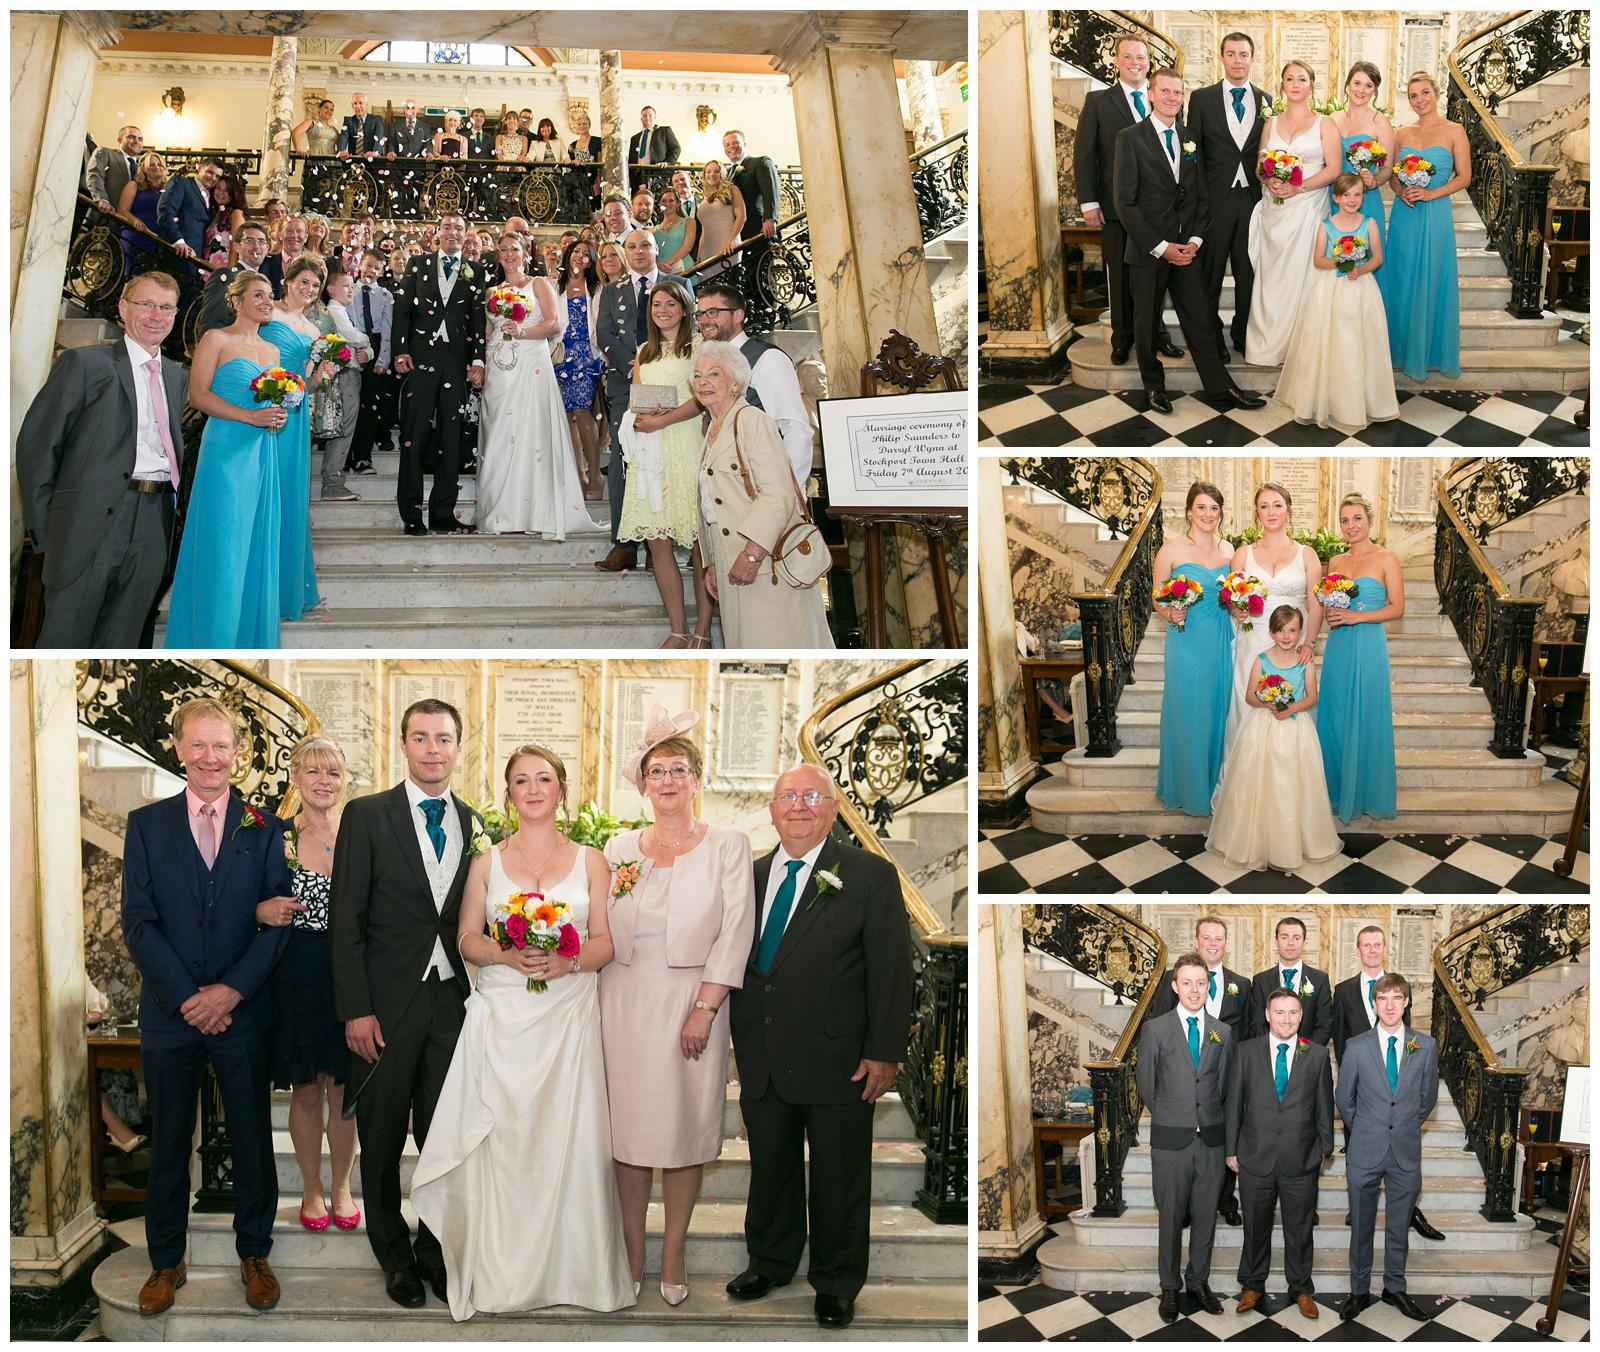 wedding-photos-stockport-town-hall